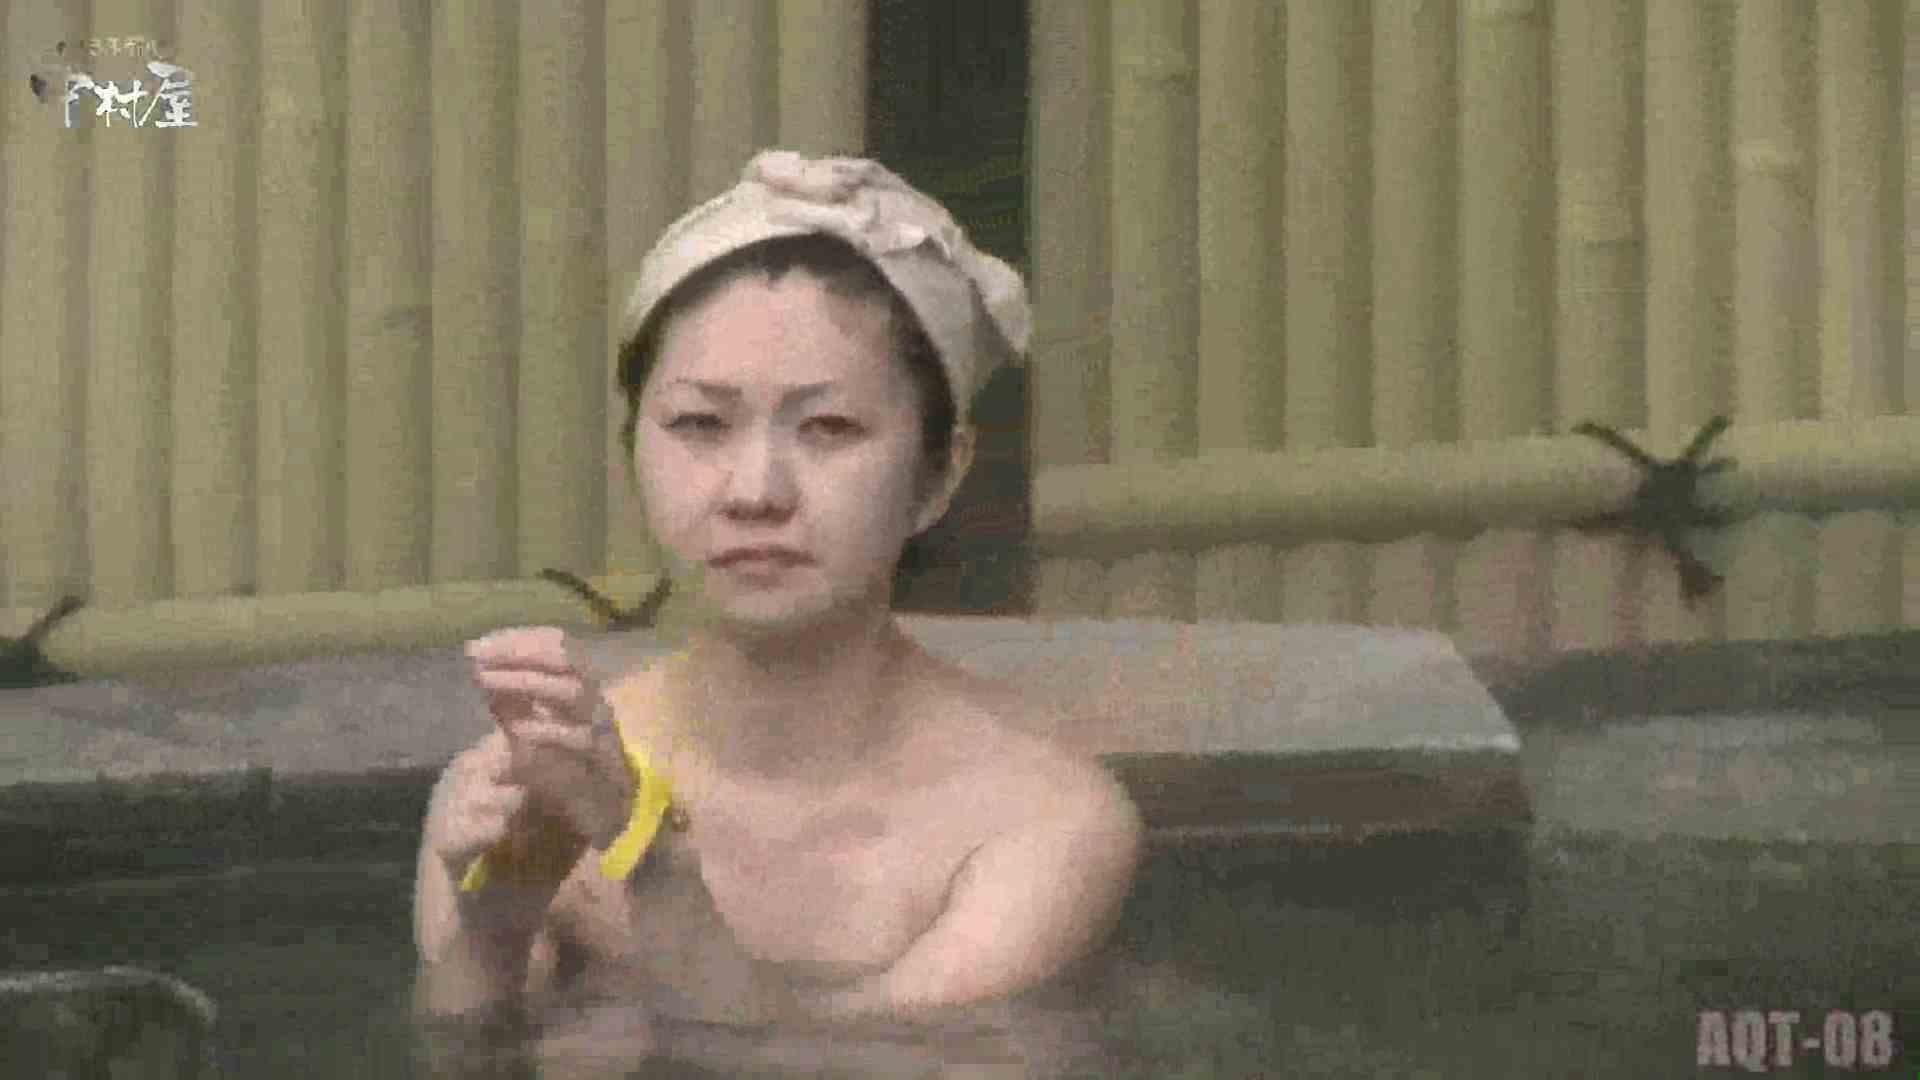 Aquaな露天風呂Vol.872潜入盗撮露天風呂八判湯 其の一 OLのプライベート | 盗撮特撮  10pic 1